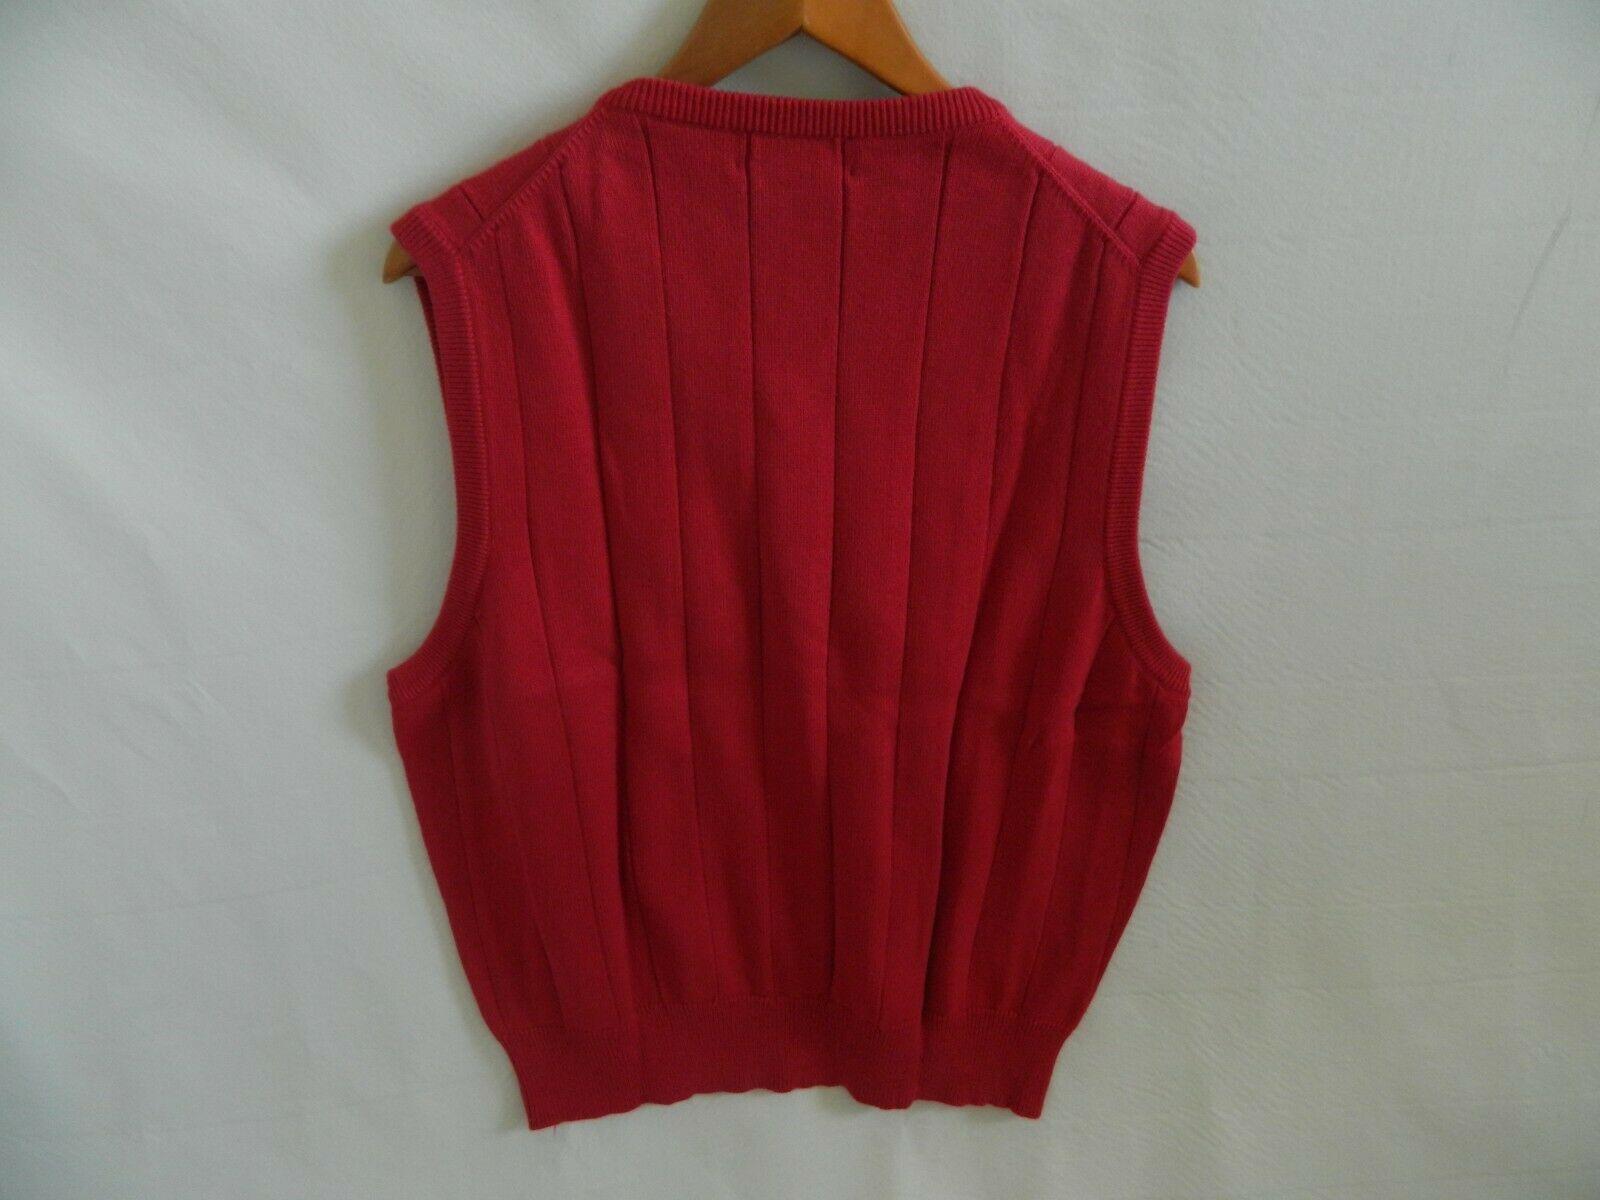 Polo Golf Ralph Lauren Mens Red 100% Cotton Sweater Vest Blue Pony Size M USA! image 2